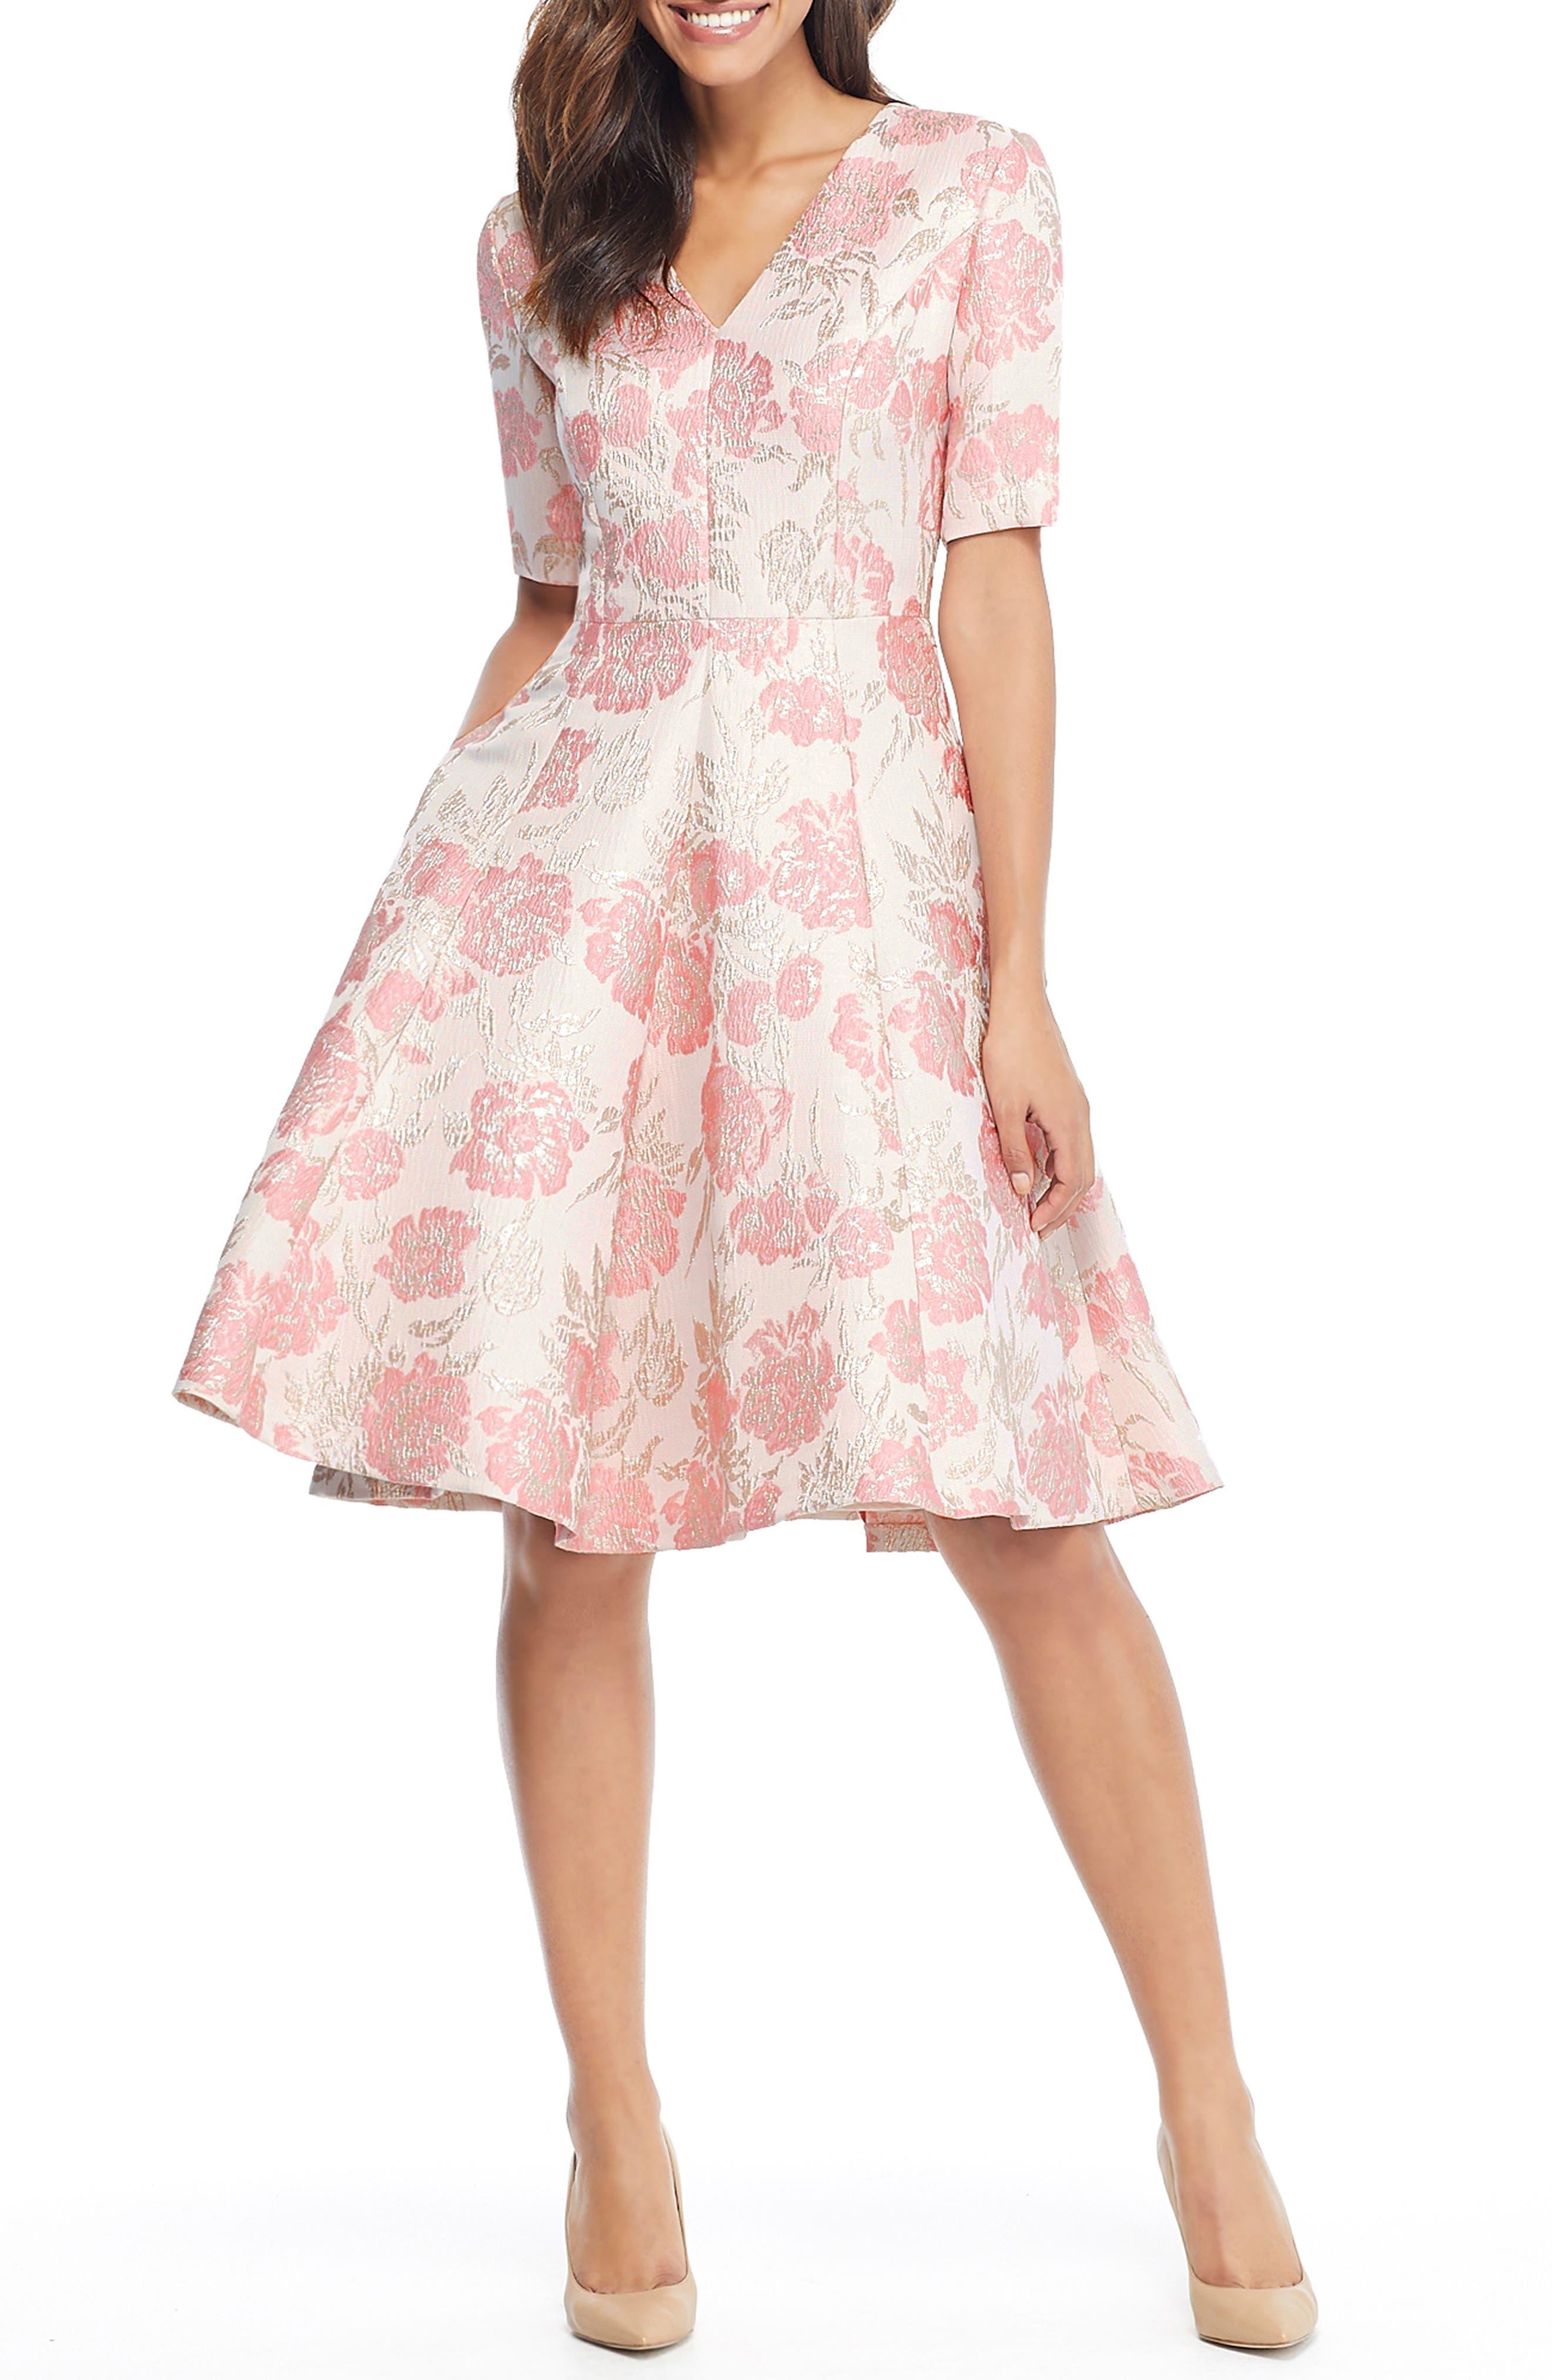 Adair Pink Passion Rose Jacquard Fit & Flare Dress,                             Alternate thumbnail 6, color,                             PINK PEARL